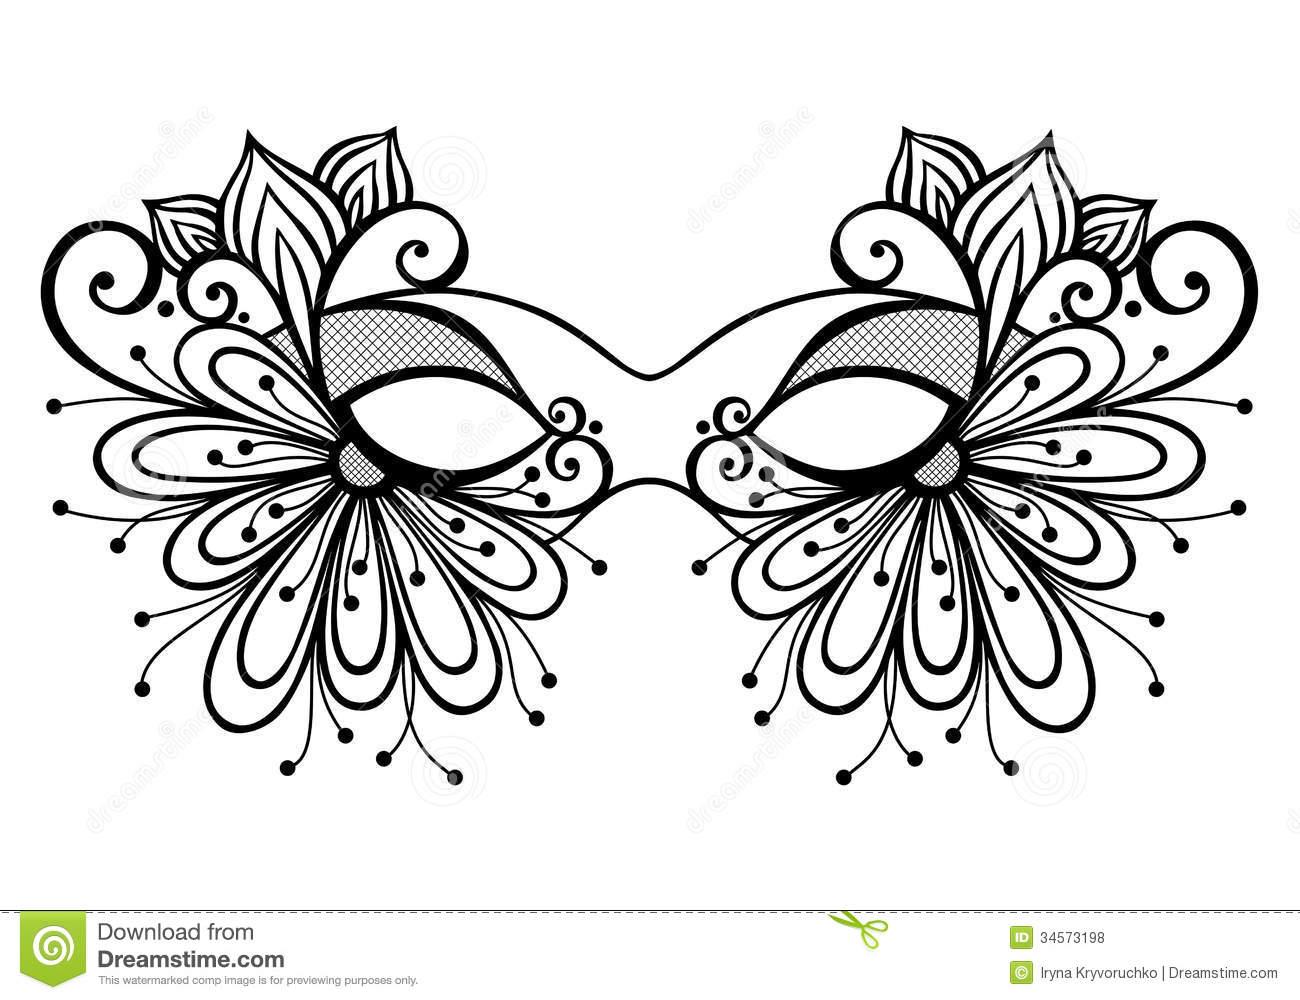 Masquerade coloring #9, Download drawings